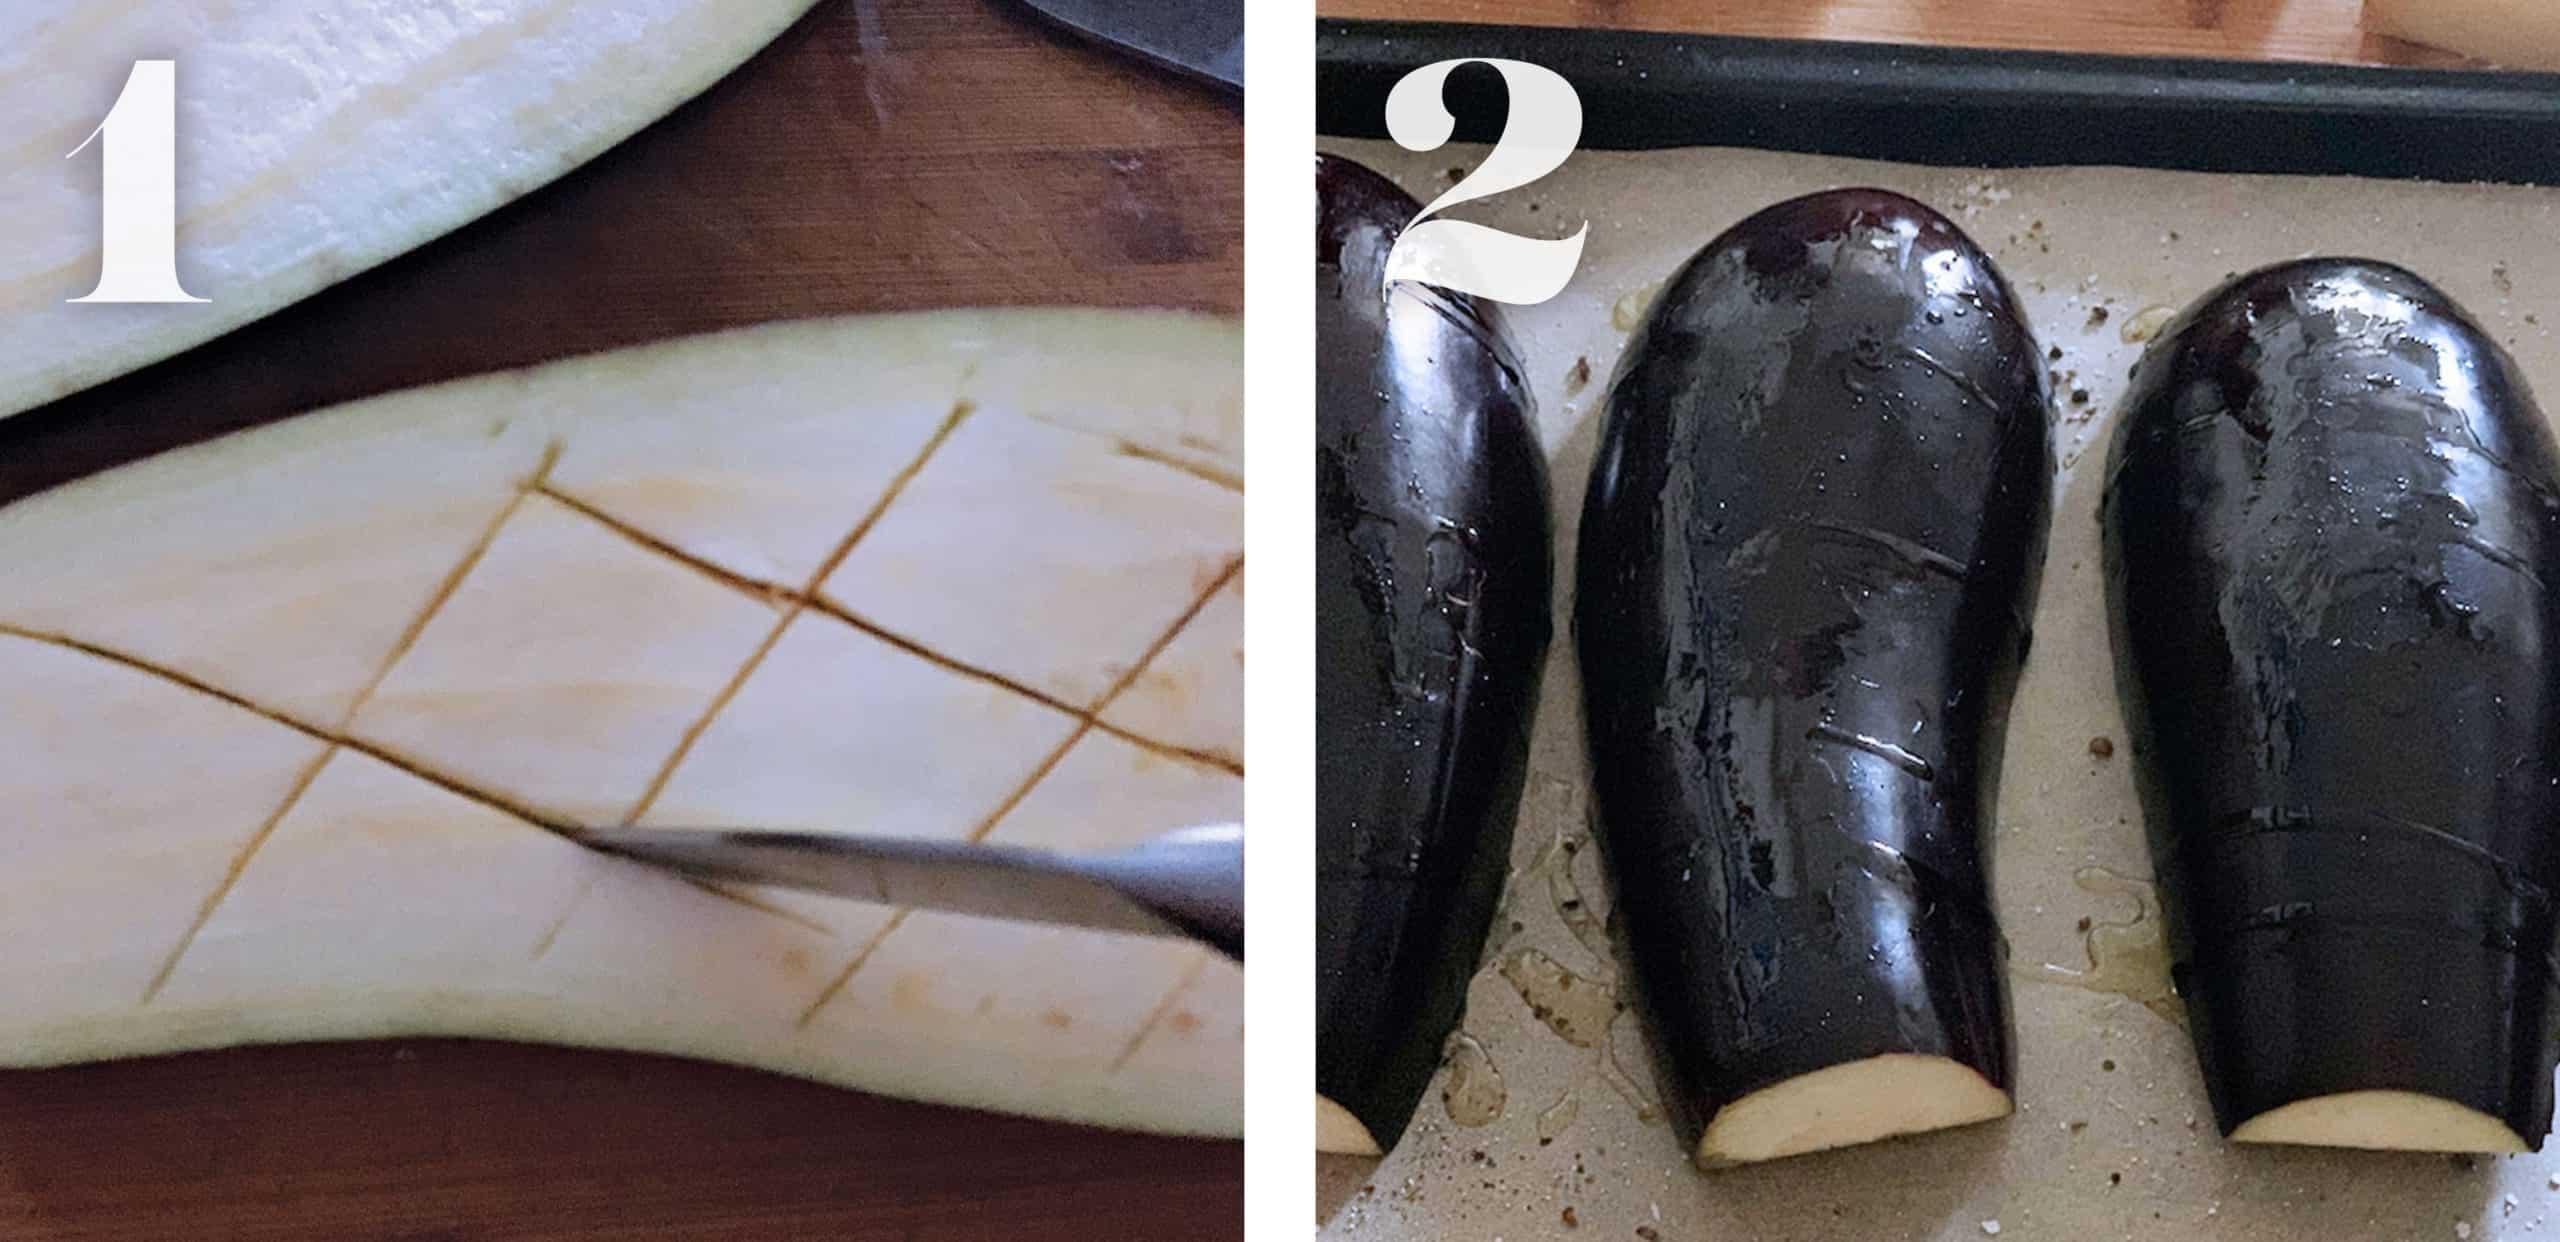 Image 1. Making cuts on eggplant flesh. Image 2. Eggplants on parchment paper.